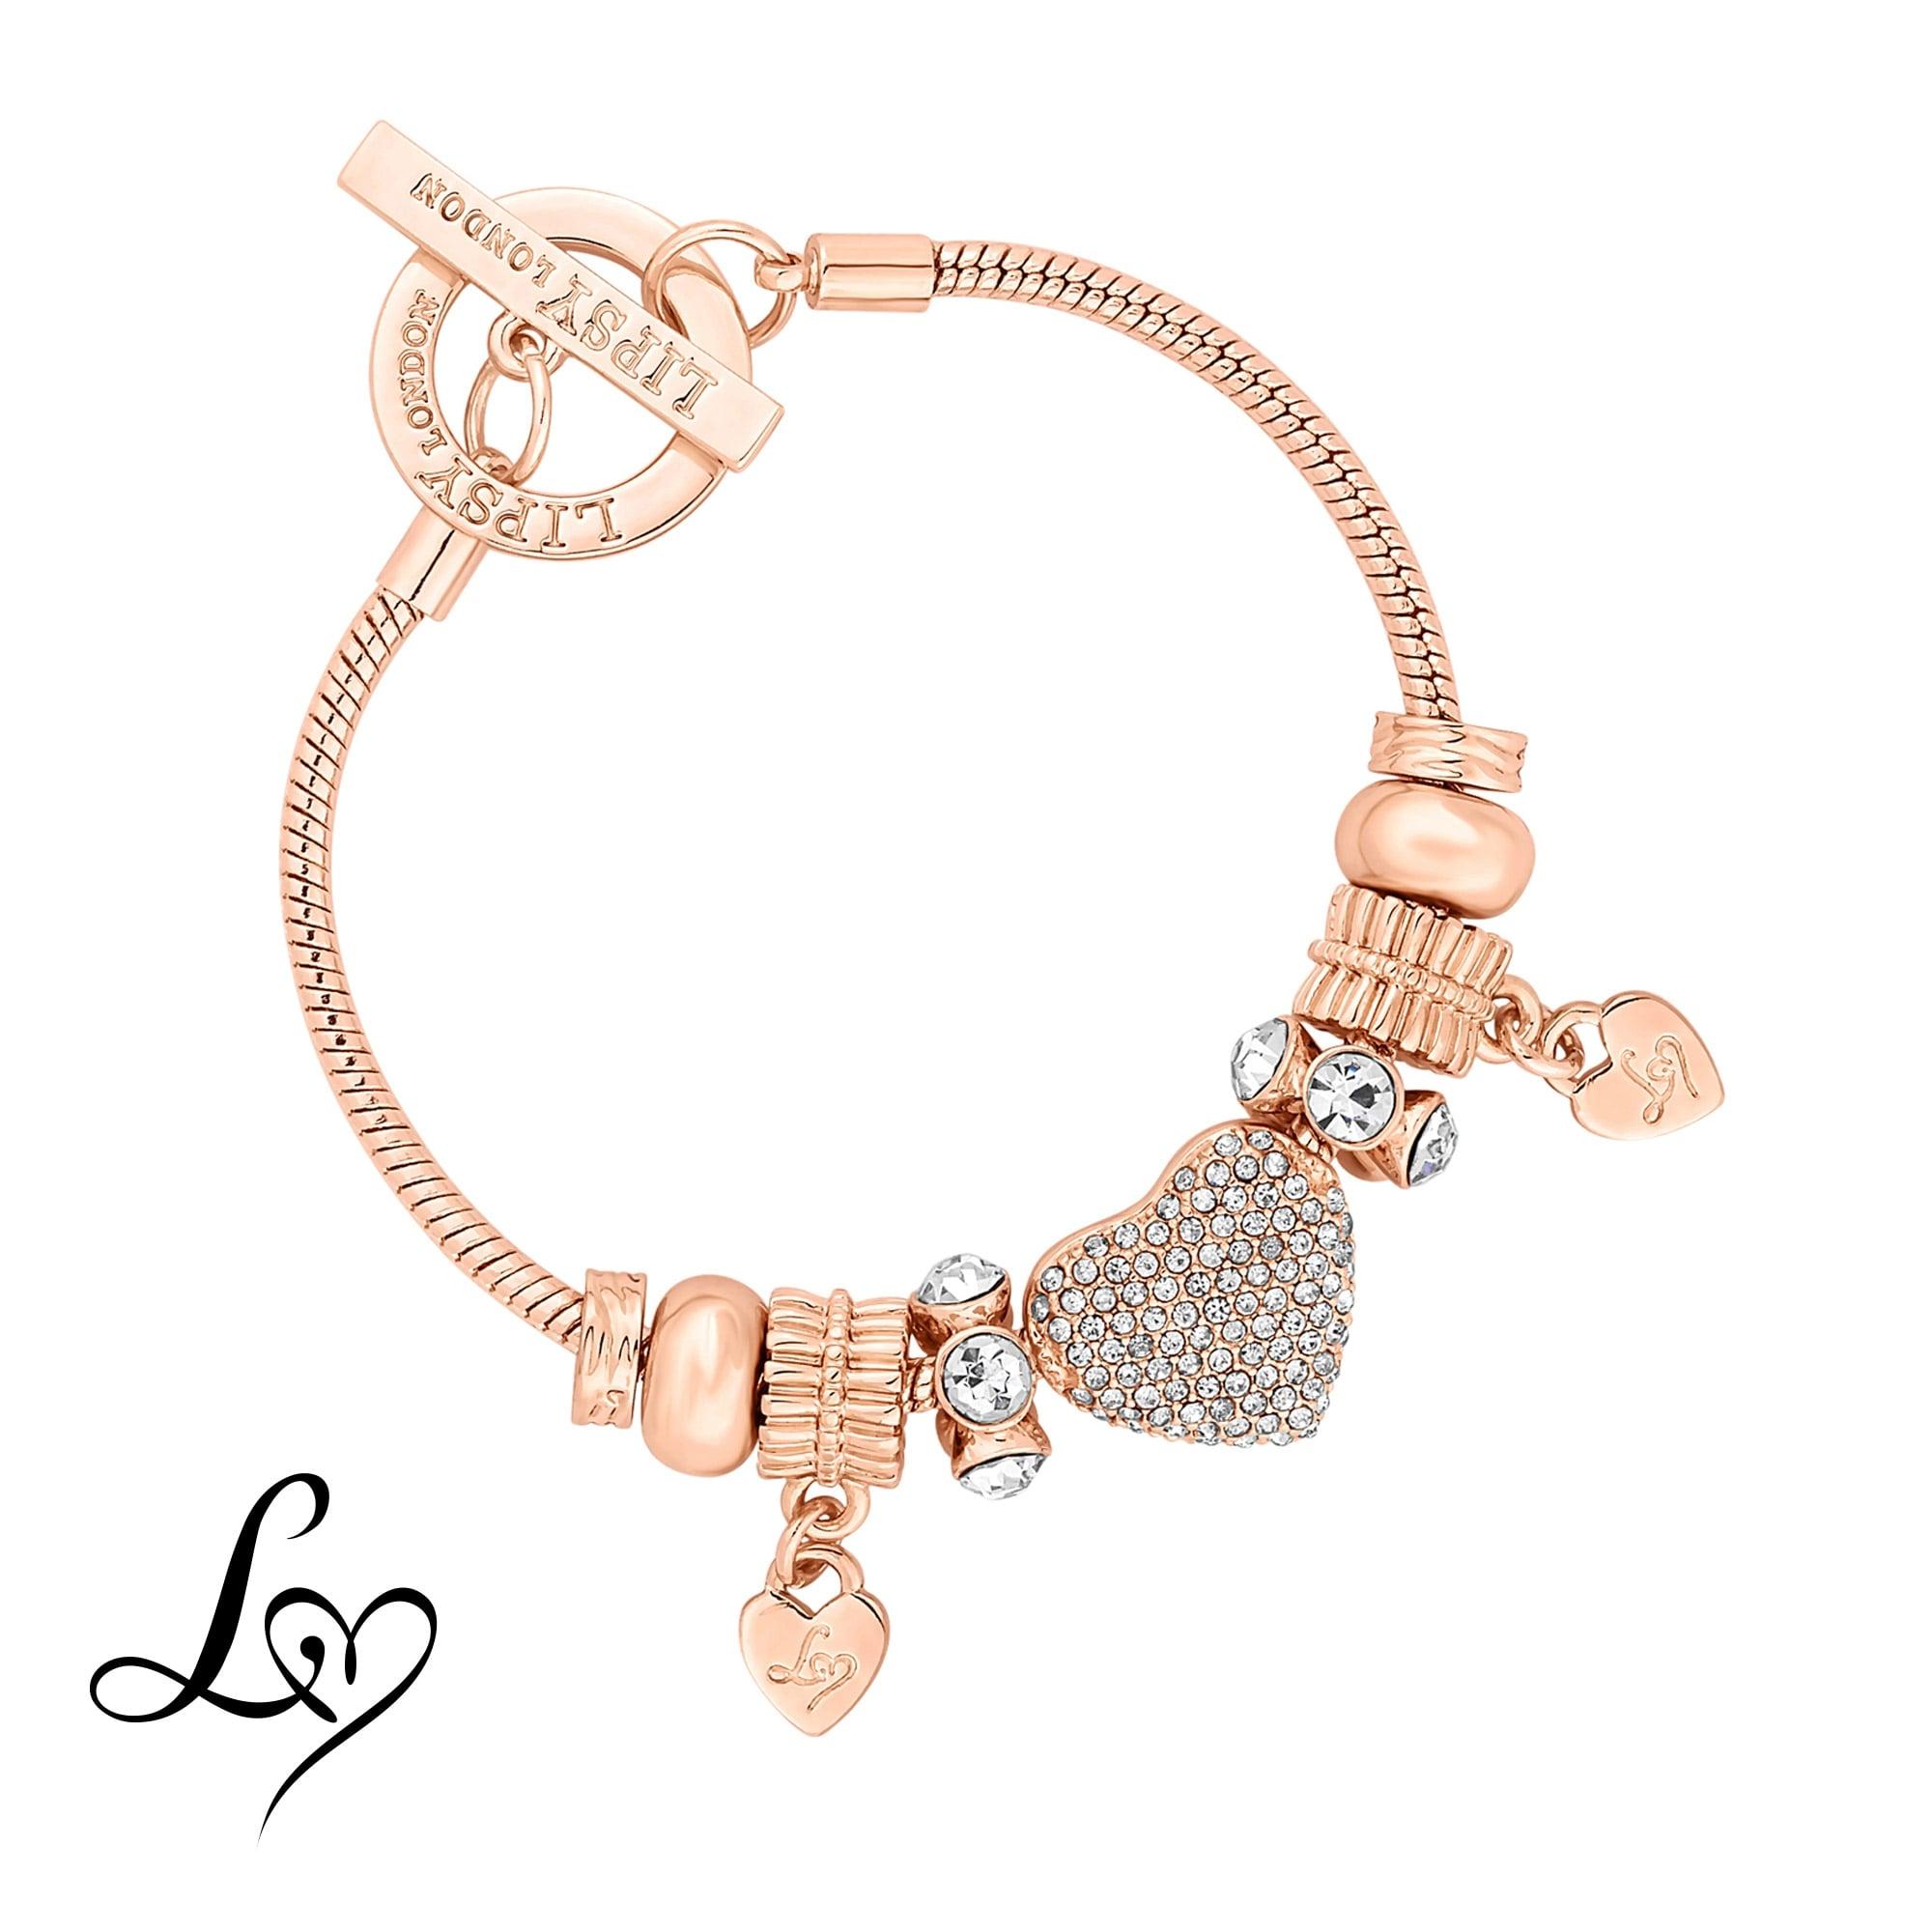 e6d6156483a33 Rose Gold Crystal Pave Charm Gift Bracelet